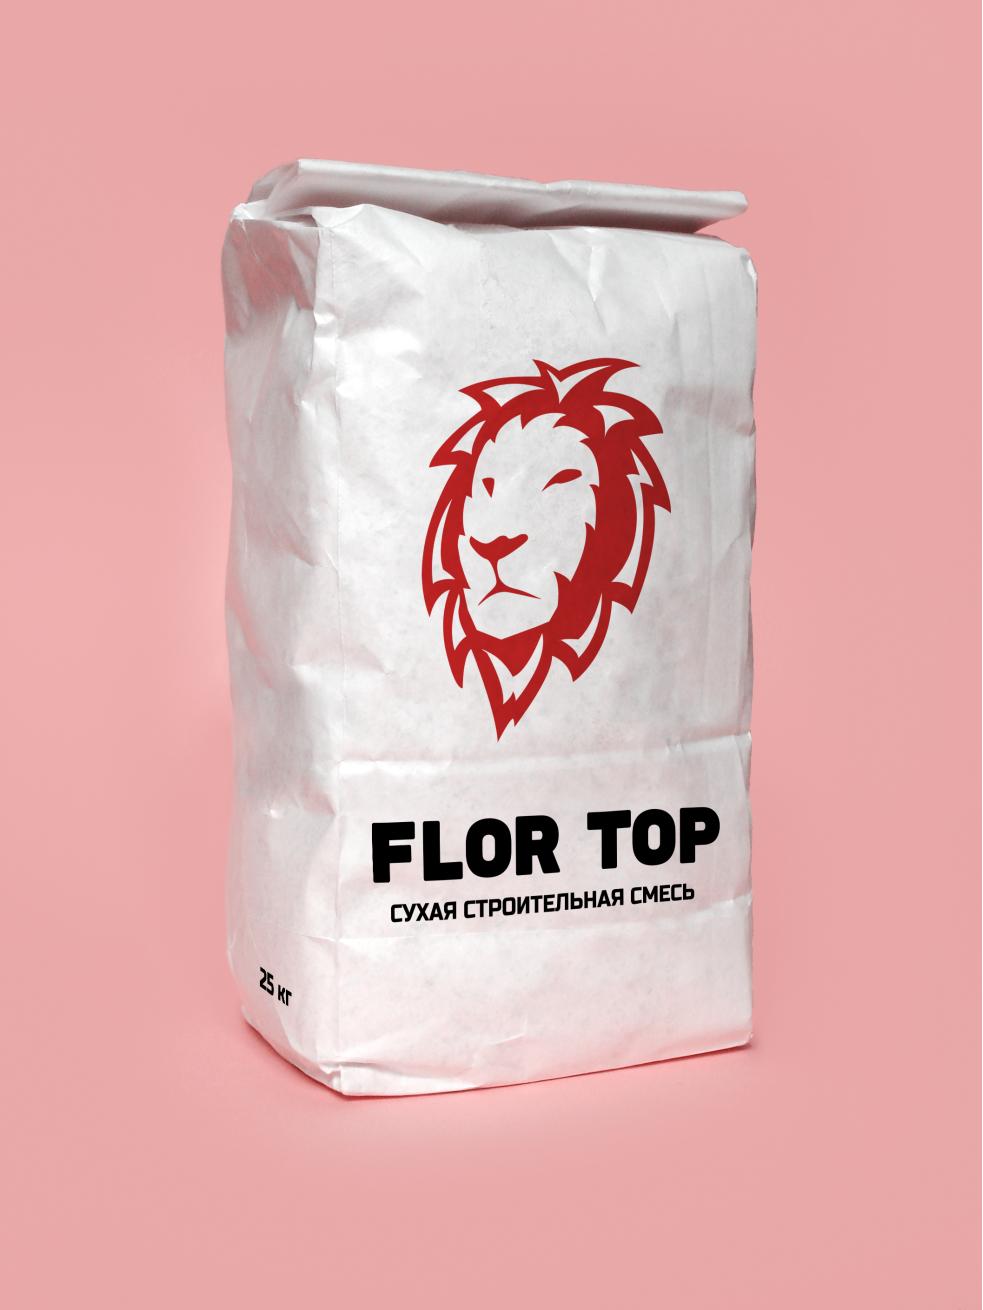 Разработка логотипа и дизайна на упаковку для сухой смеси фото f_7375d2a836c8b248.png